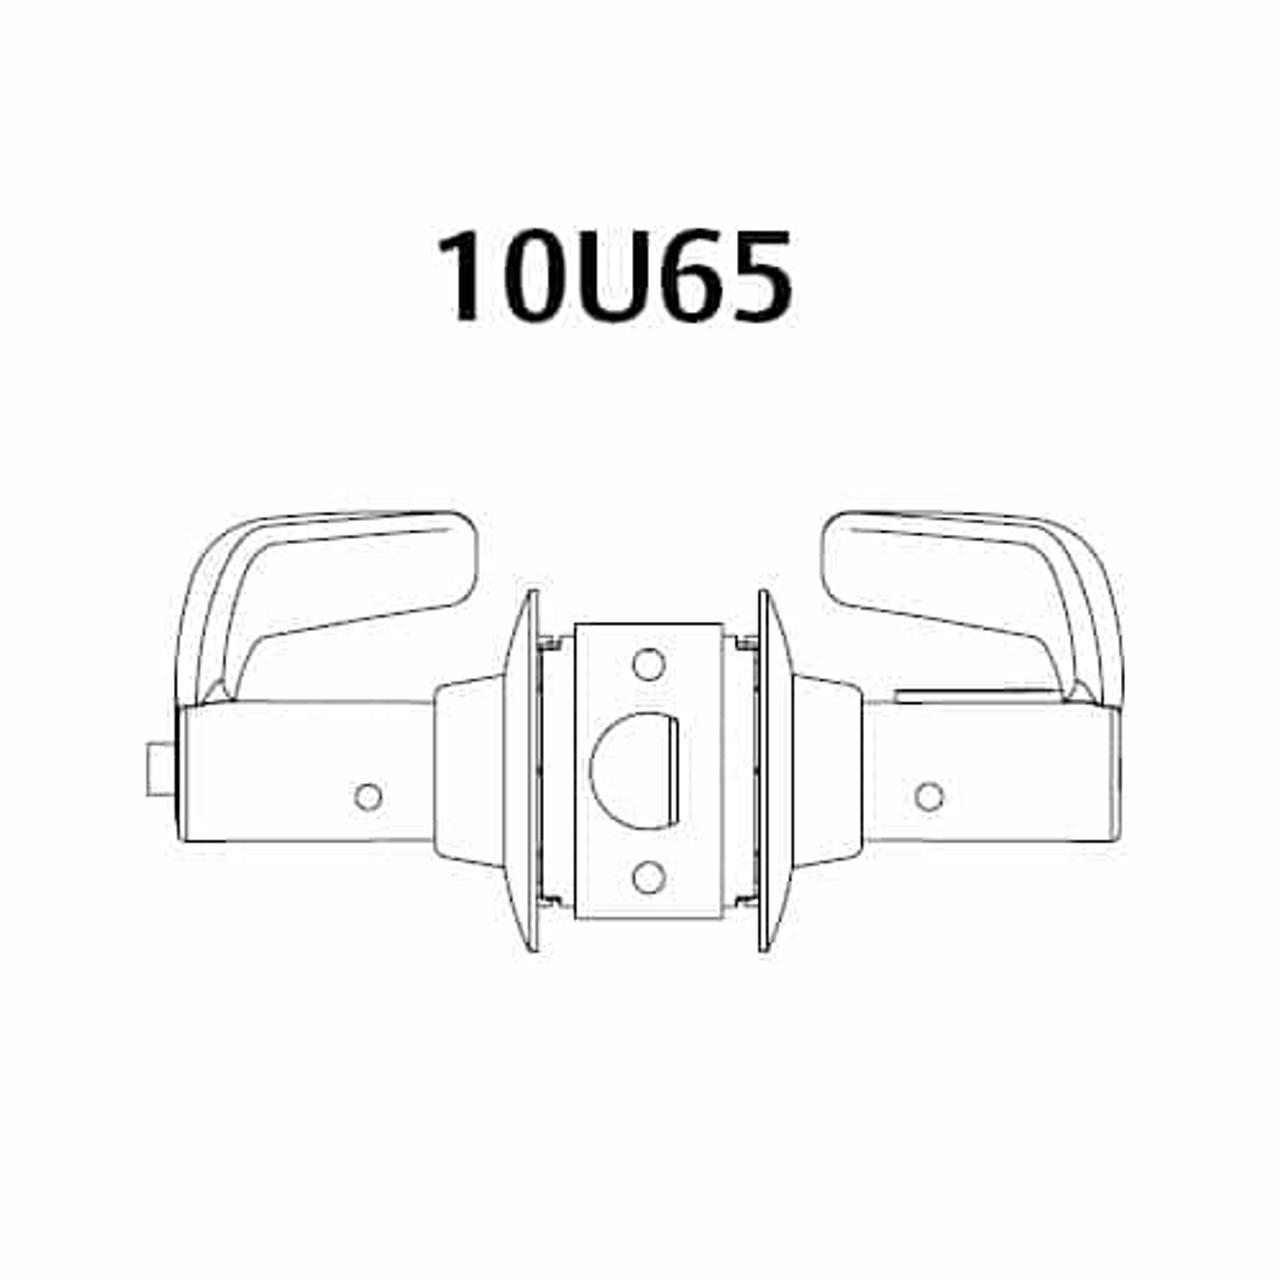 28-10U65-GJ-10B Sargent 10 Line Cylindrical Privacy Locks